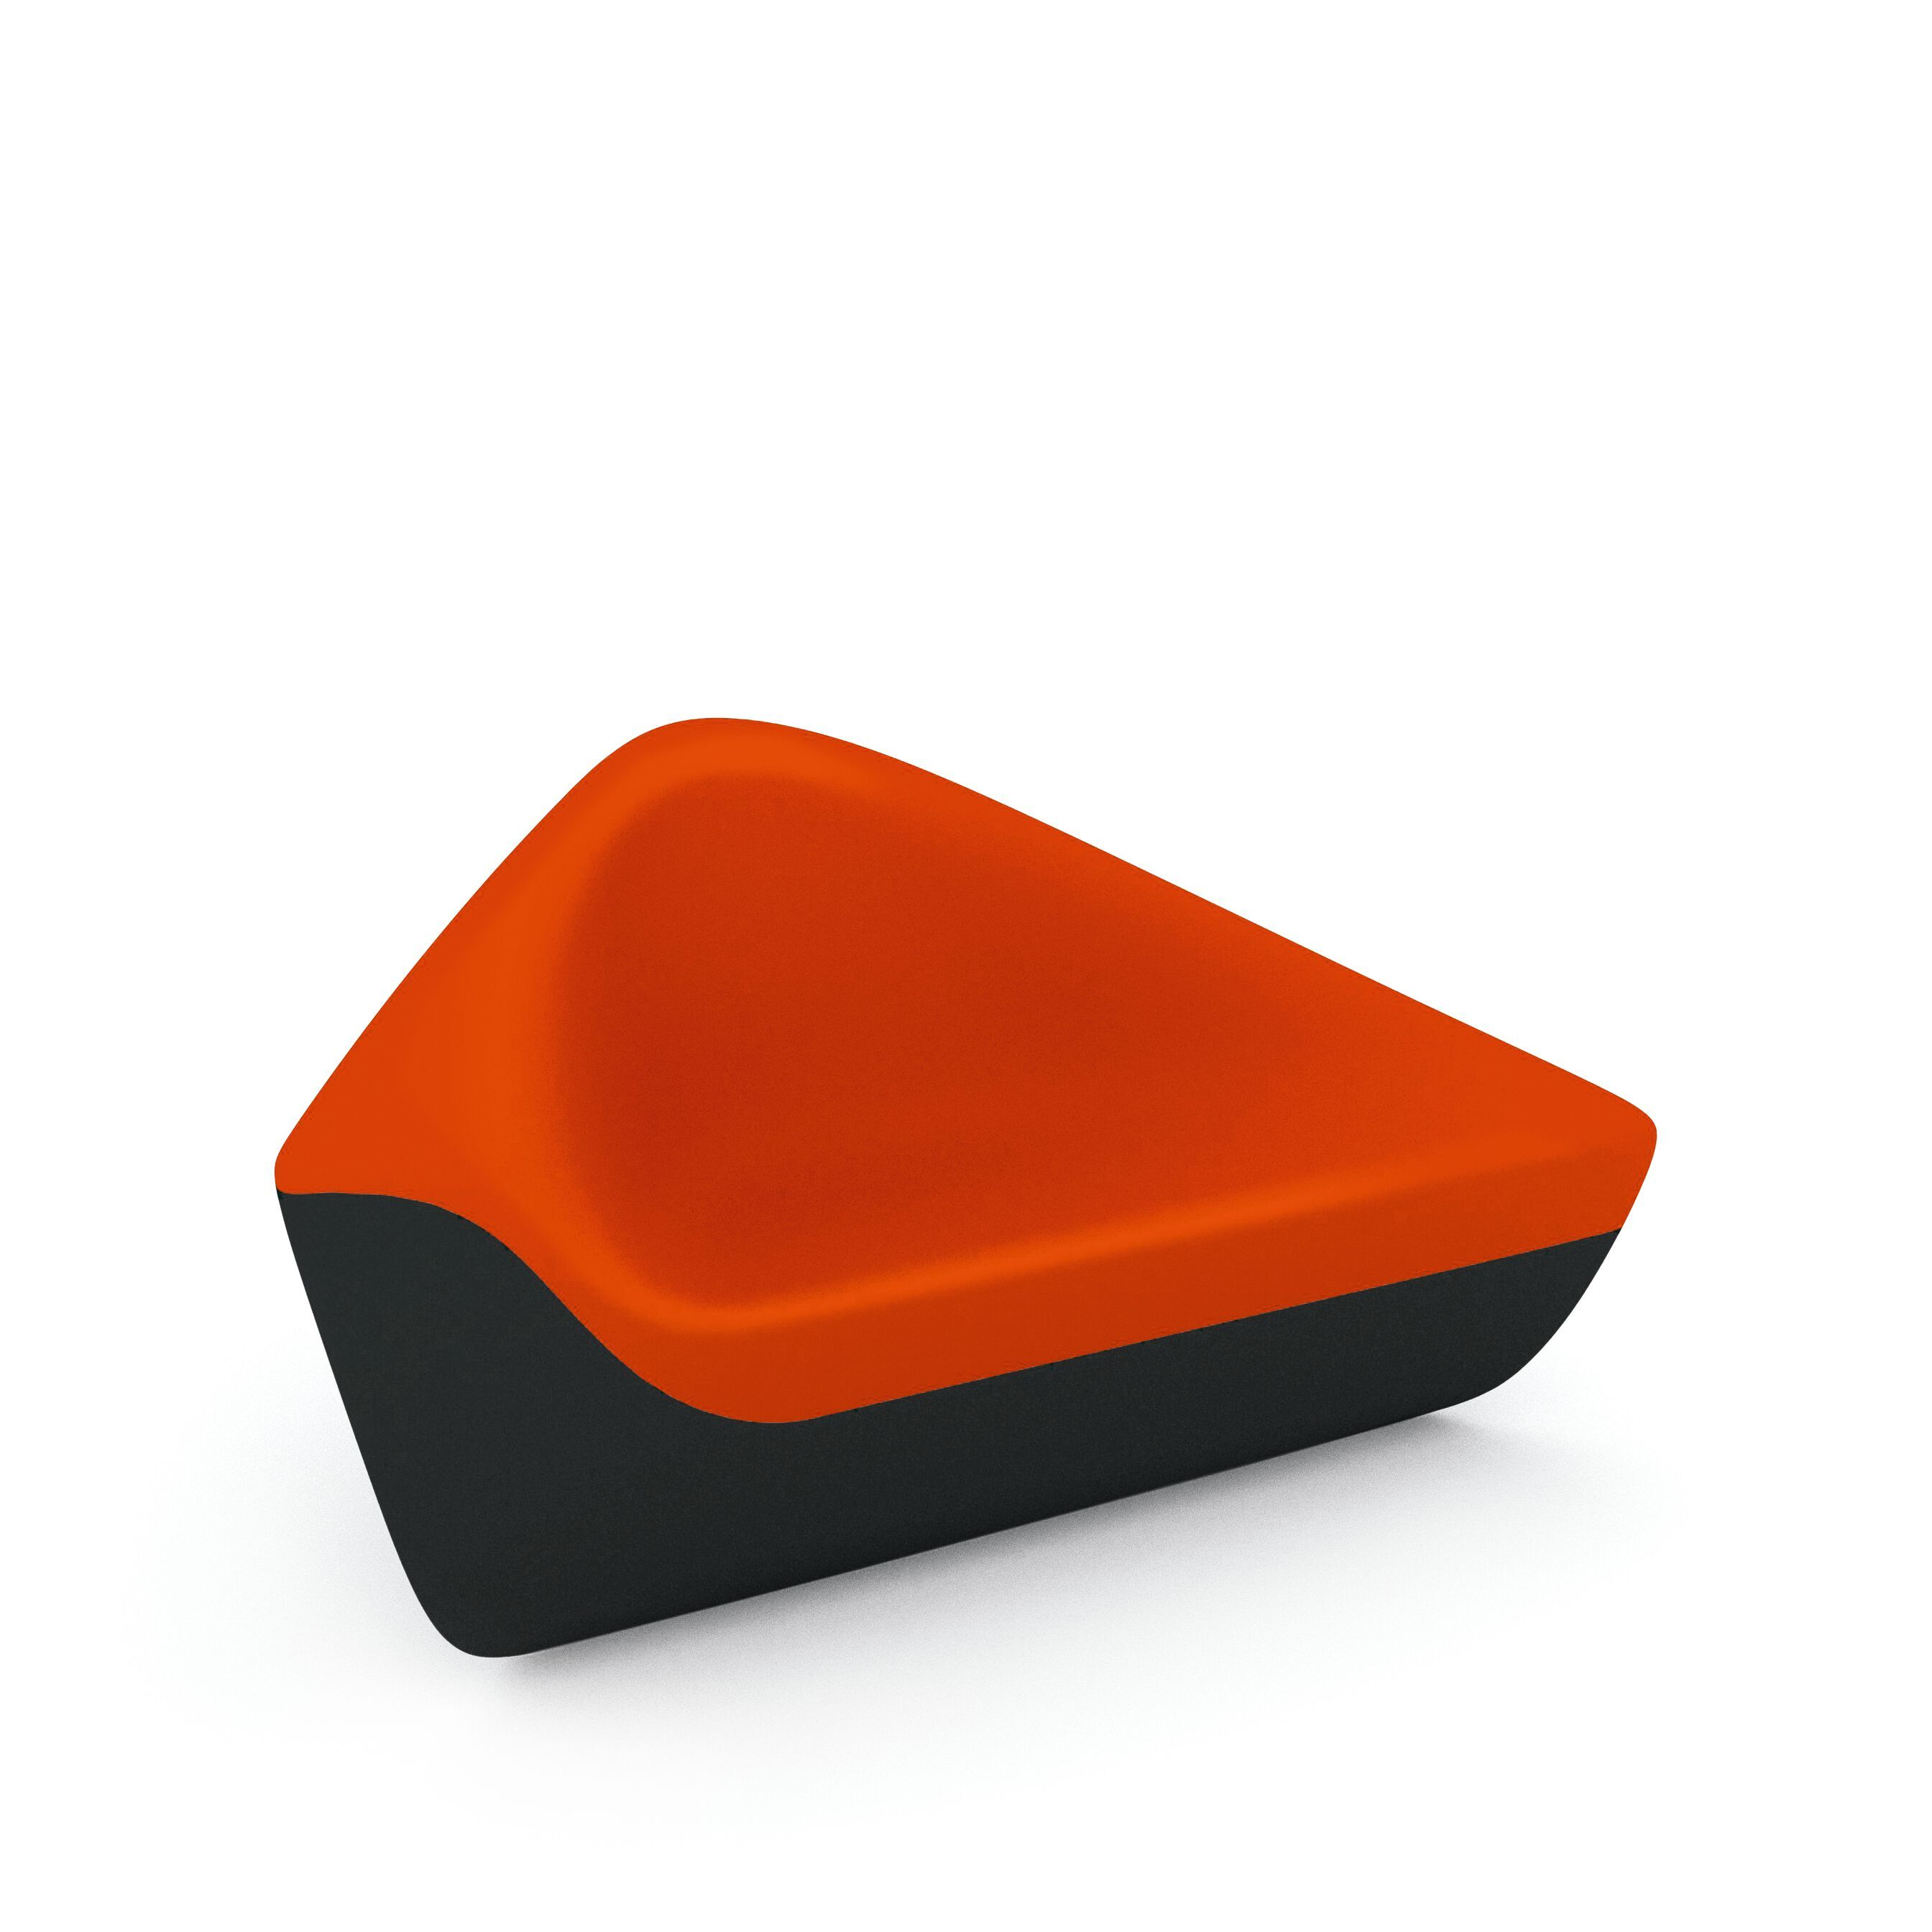 02-WK-Seating_Stones_Lounge_Chair-0011-H.tif